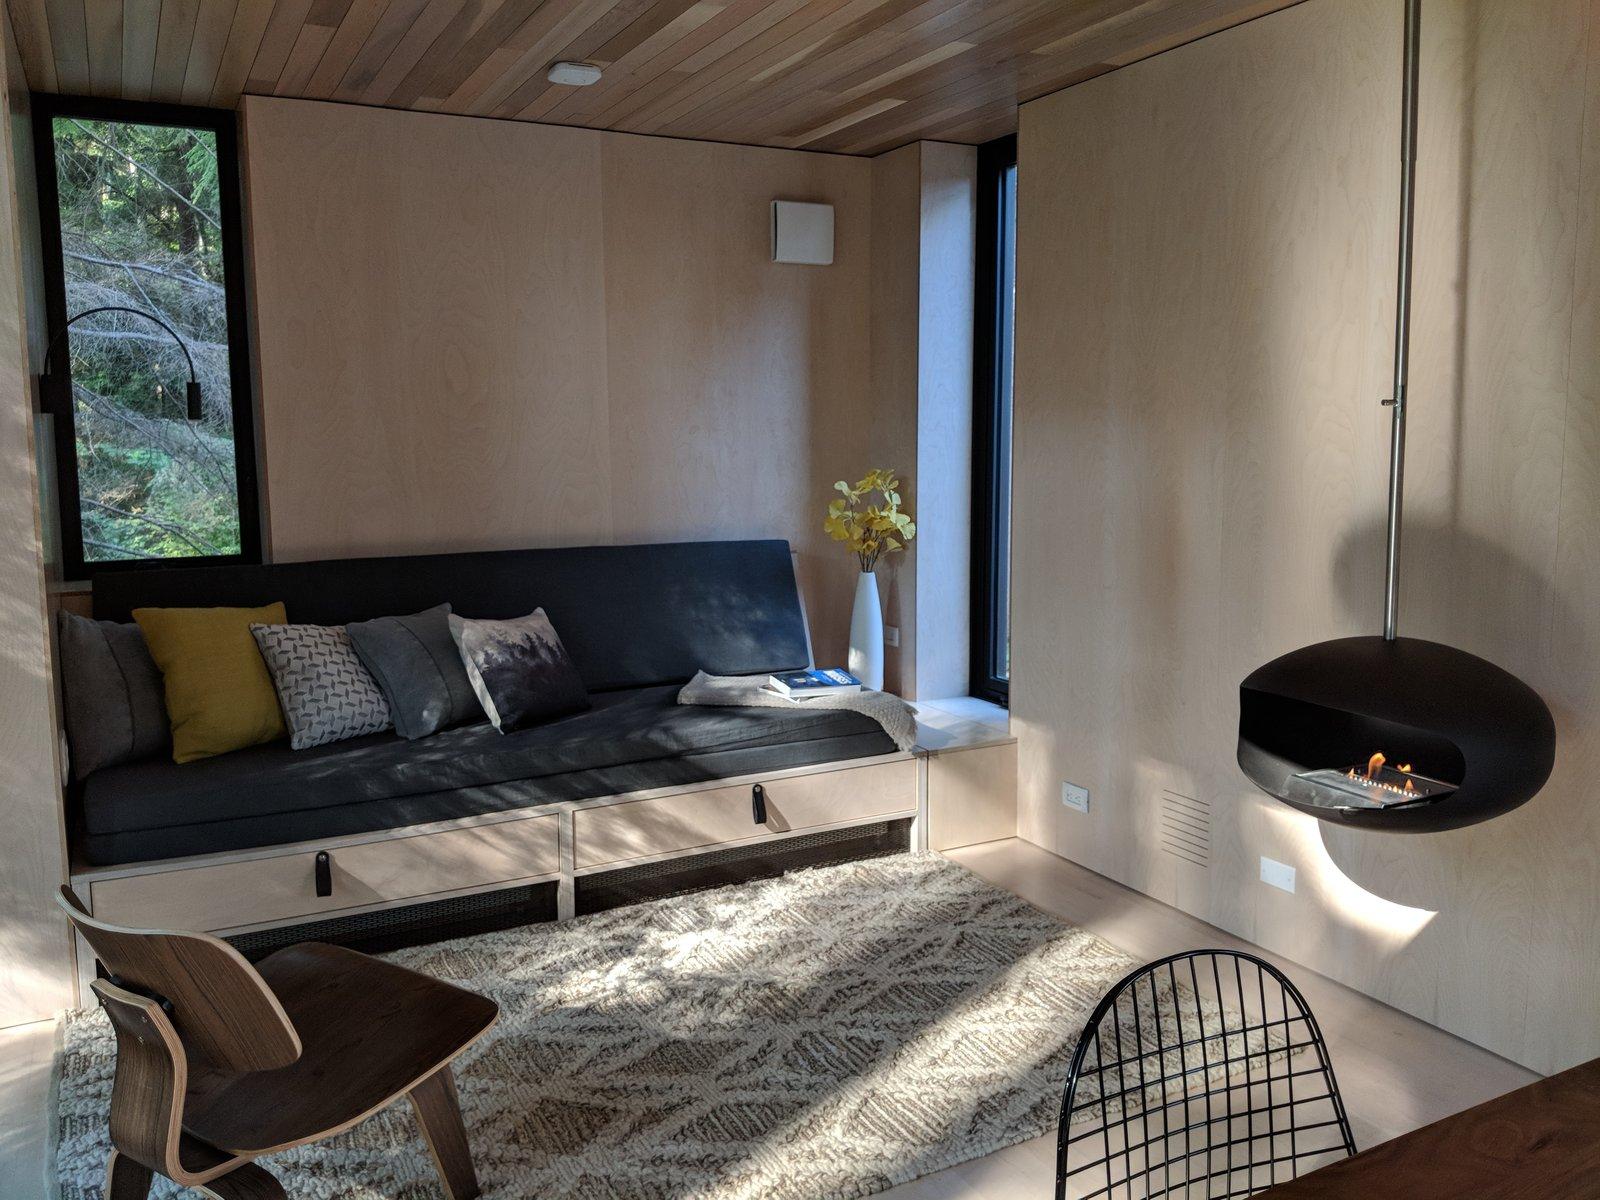 NODE Prefab Homes Aim at a Carbon Negative Future